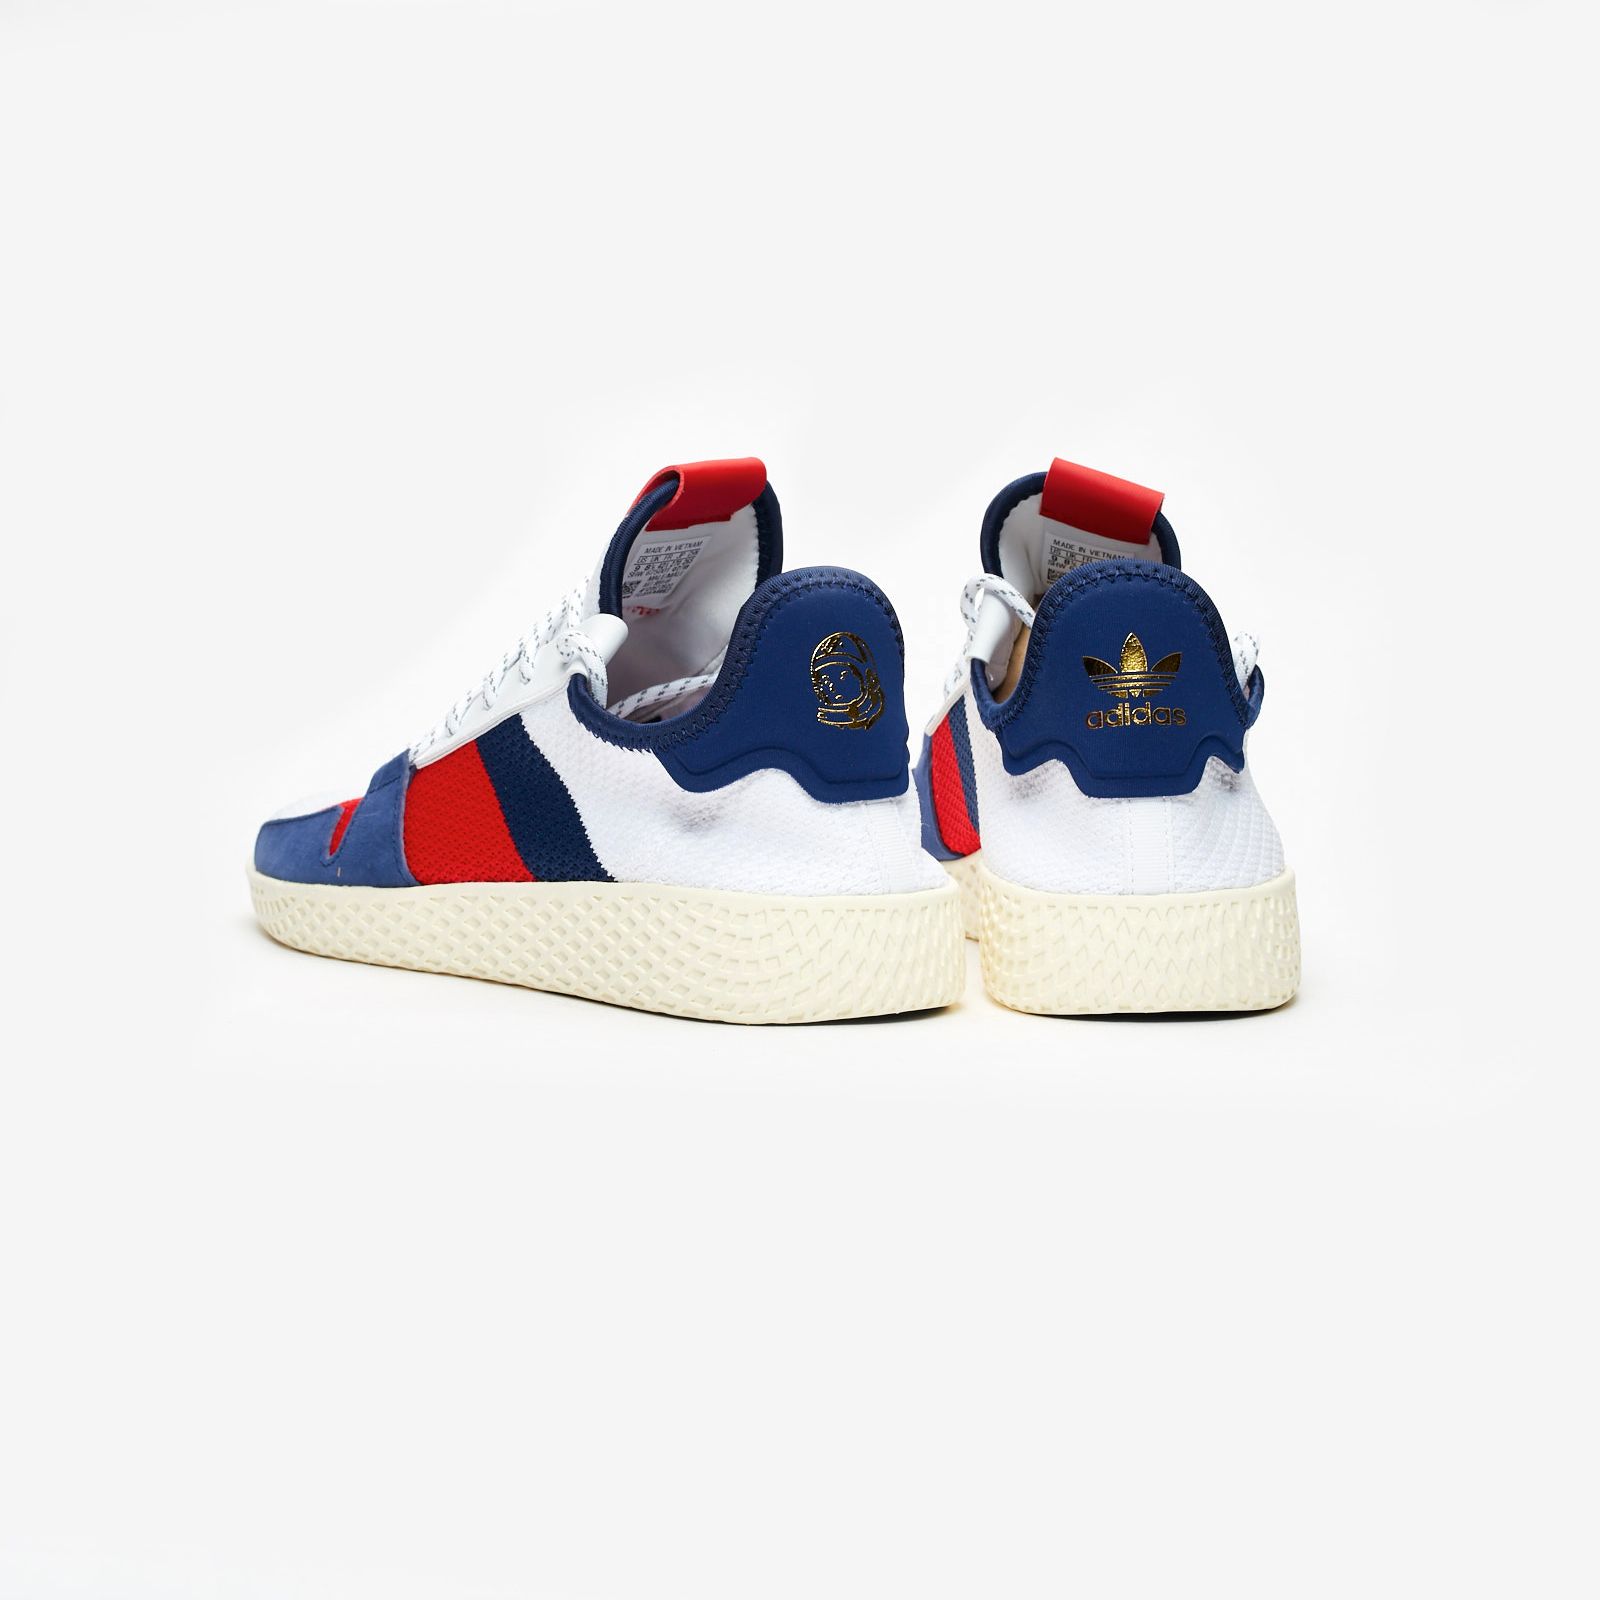 ce6f6c96e adidas Tennis Hu x BBC - Bb9549 - Sneakersnstuff